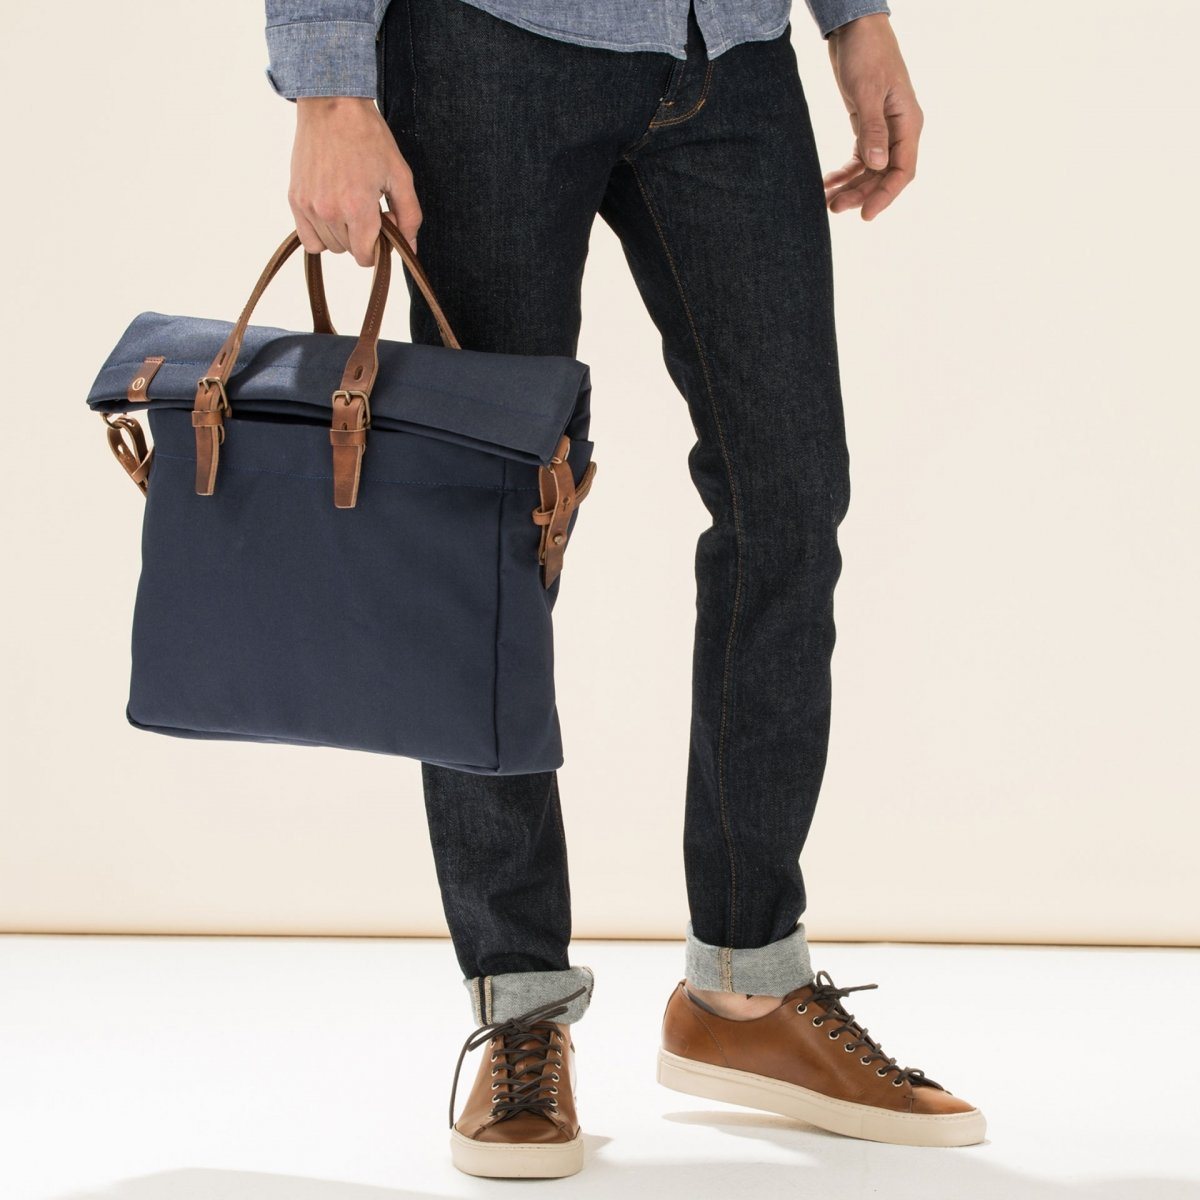 Remix business bag - Peacoat Blue (image n°5)